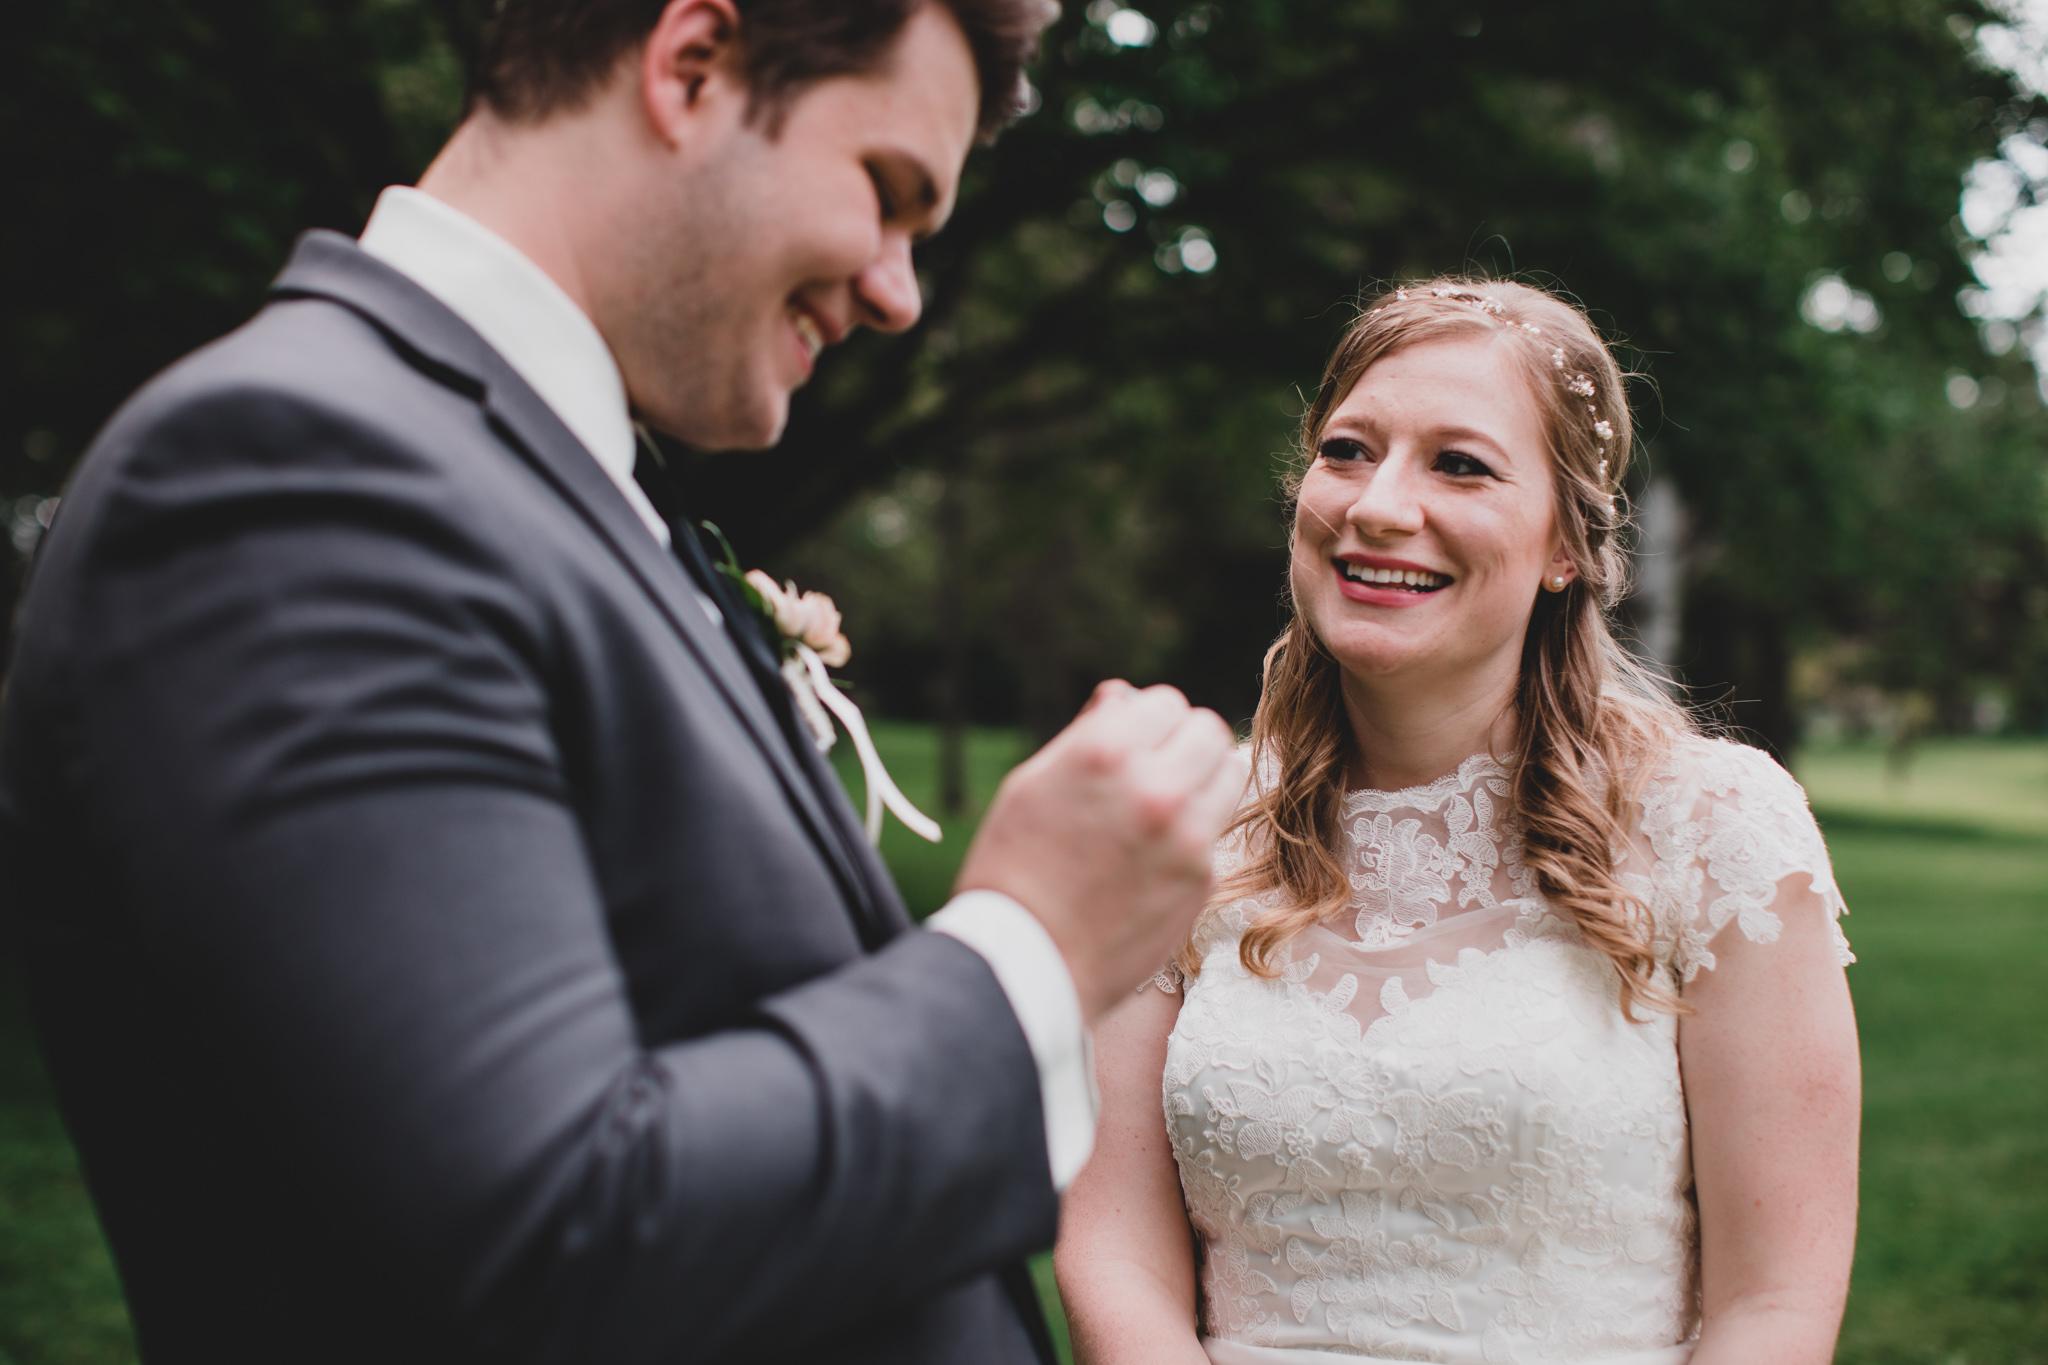 541-WEB-Jonathan-Kuhn-Photography-BenHayley-Wedding-4976.jpg